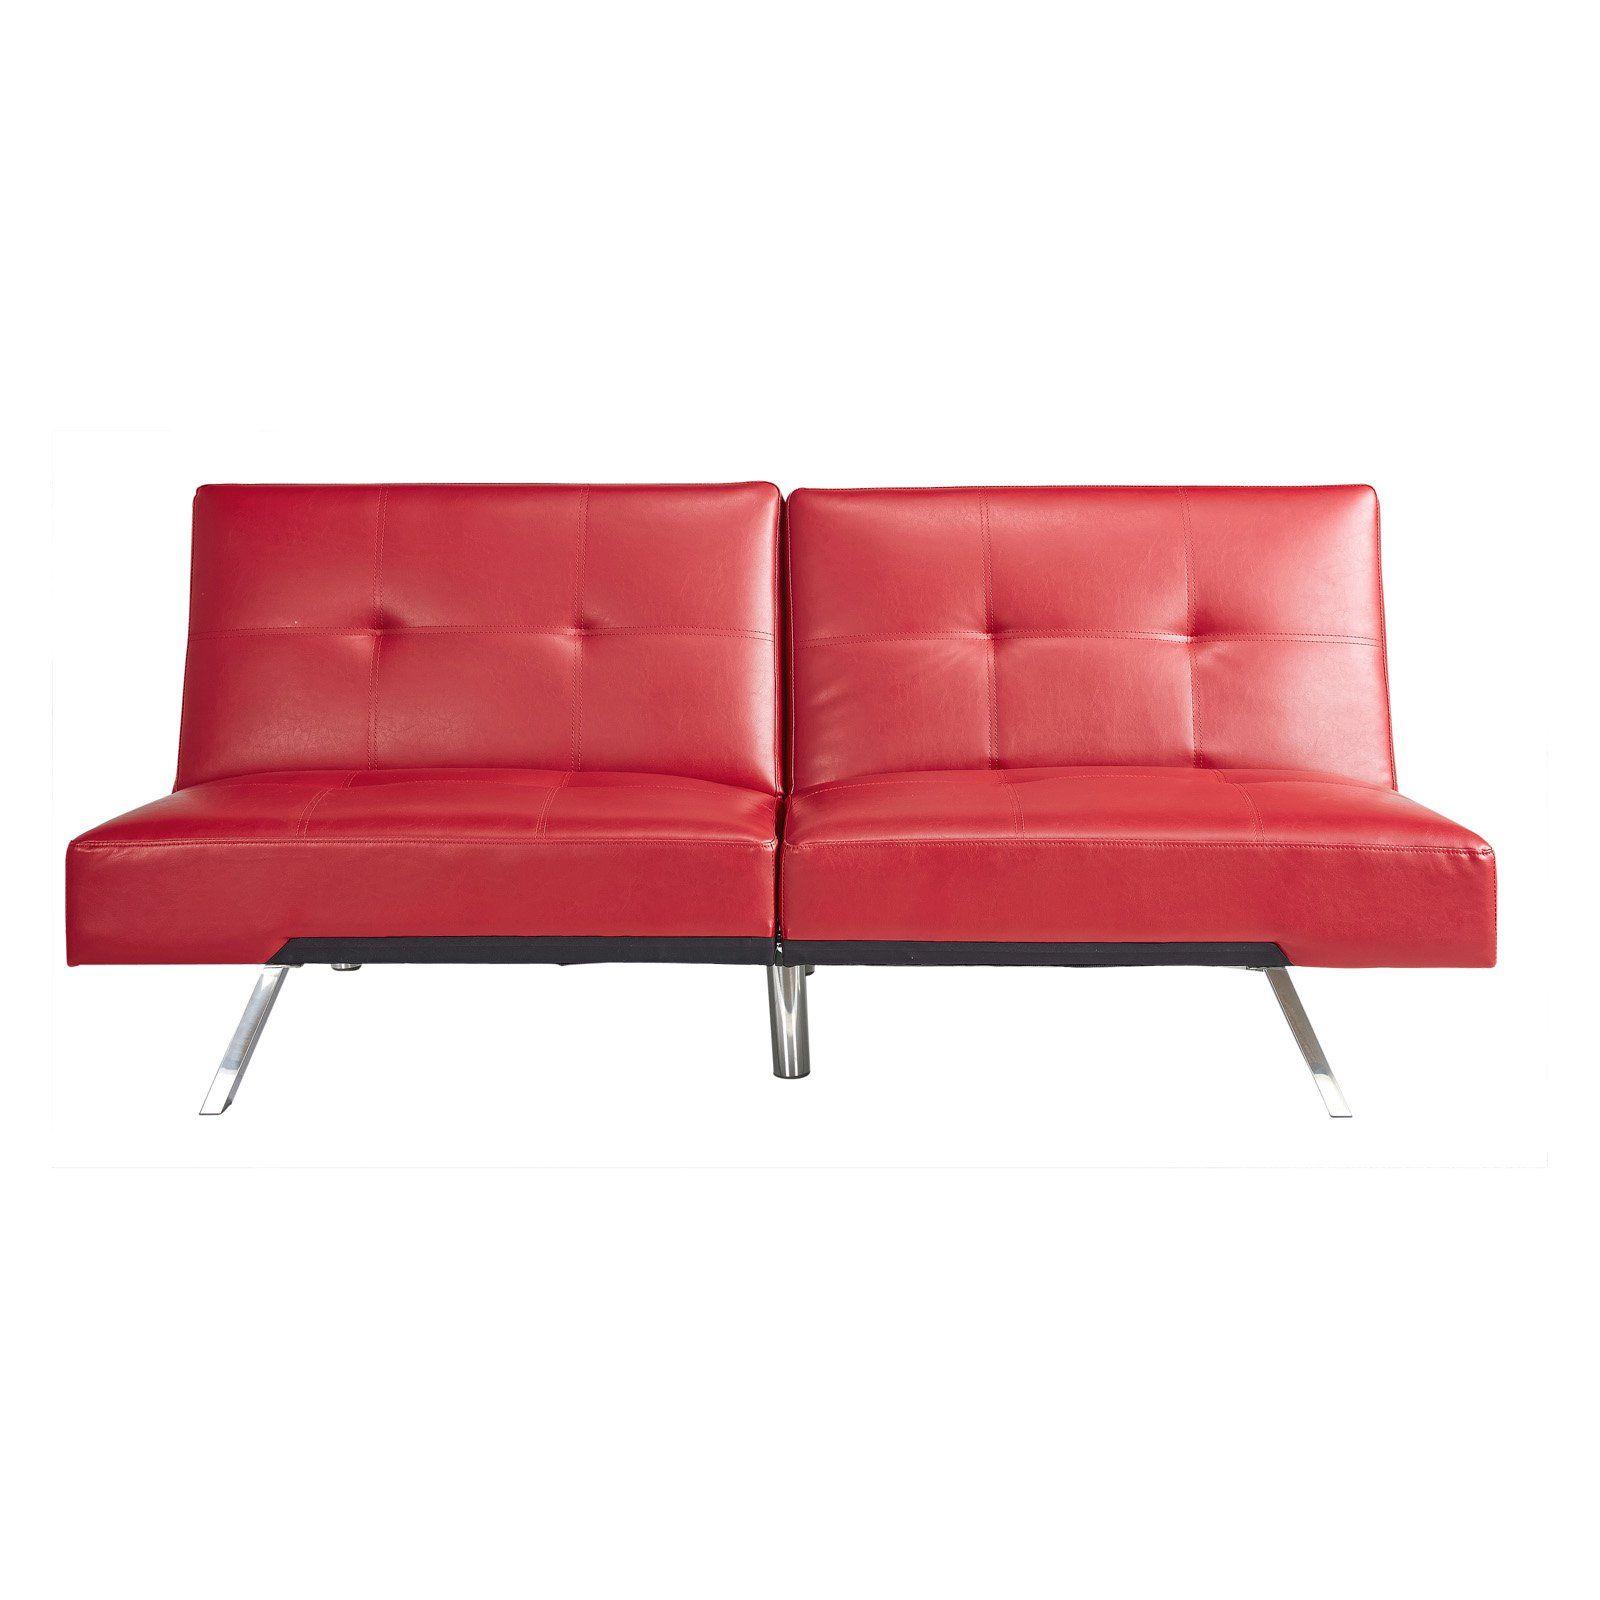 Abbyson Aspen Leather Convertible Sofa Red in 2019 ...